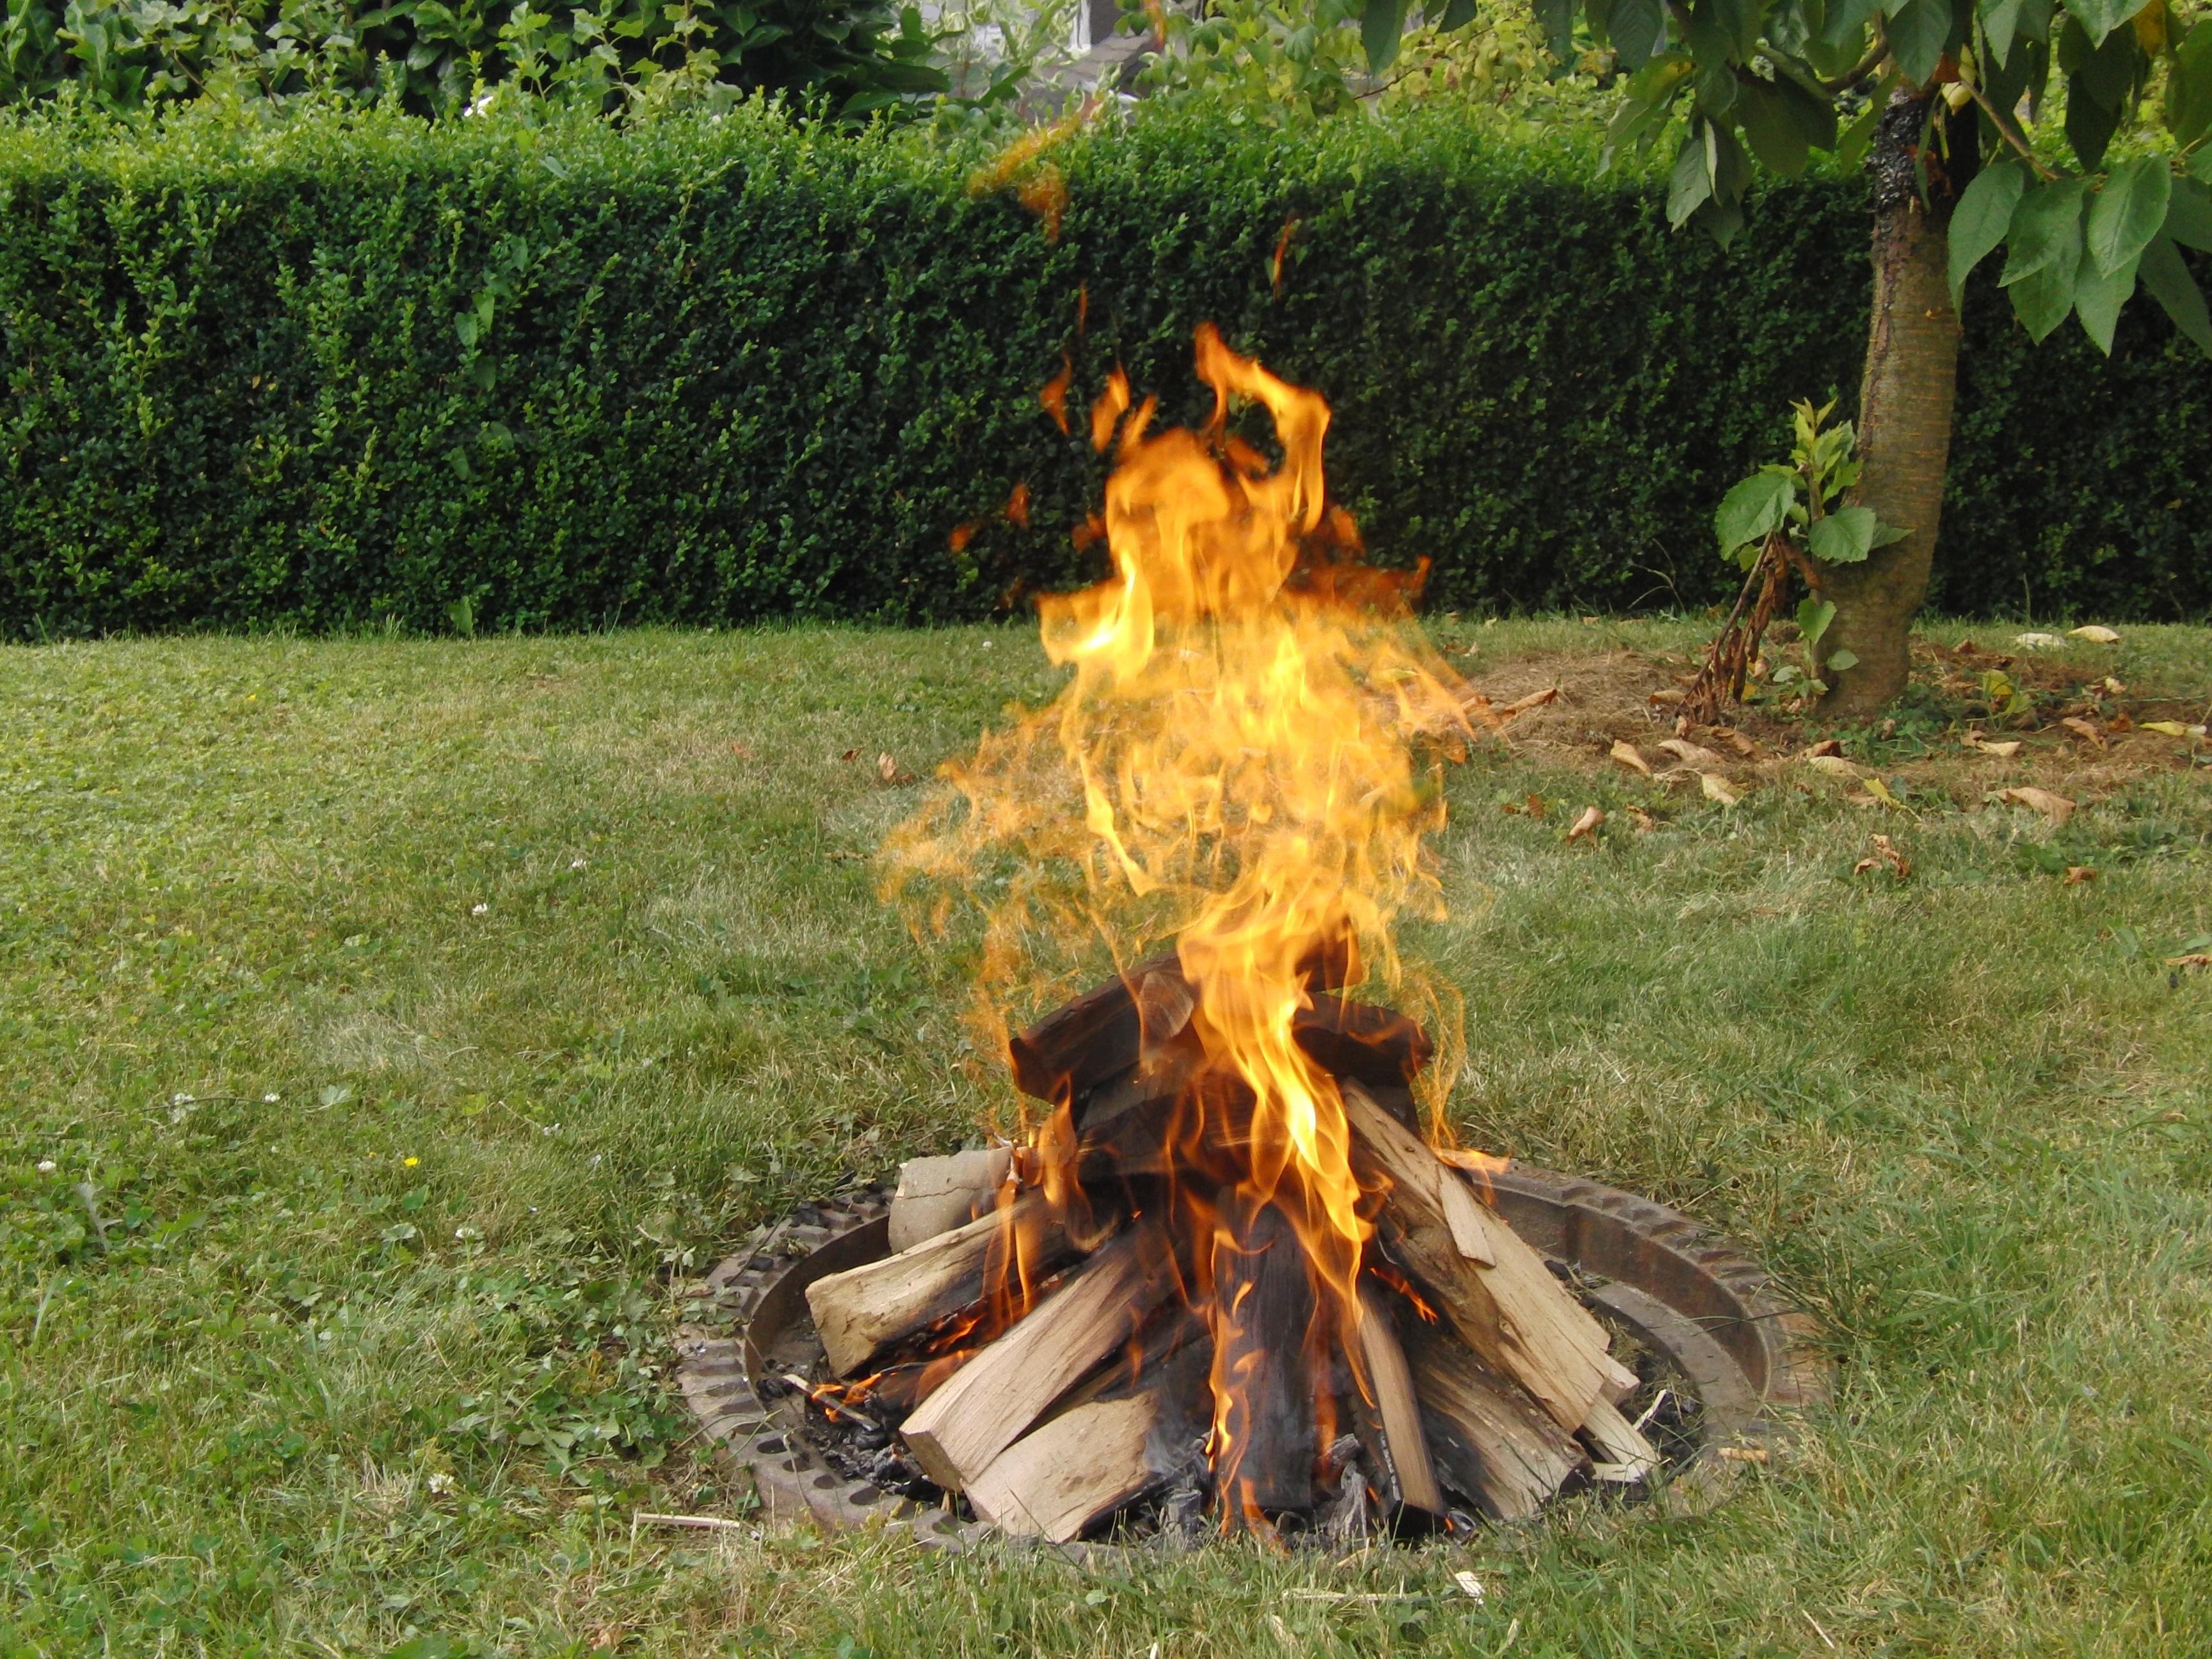 Fotos Gratis Encender Fuego Chimenea Jardin Hoguera Parilla - Chimenea-jardin